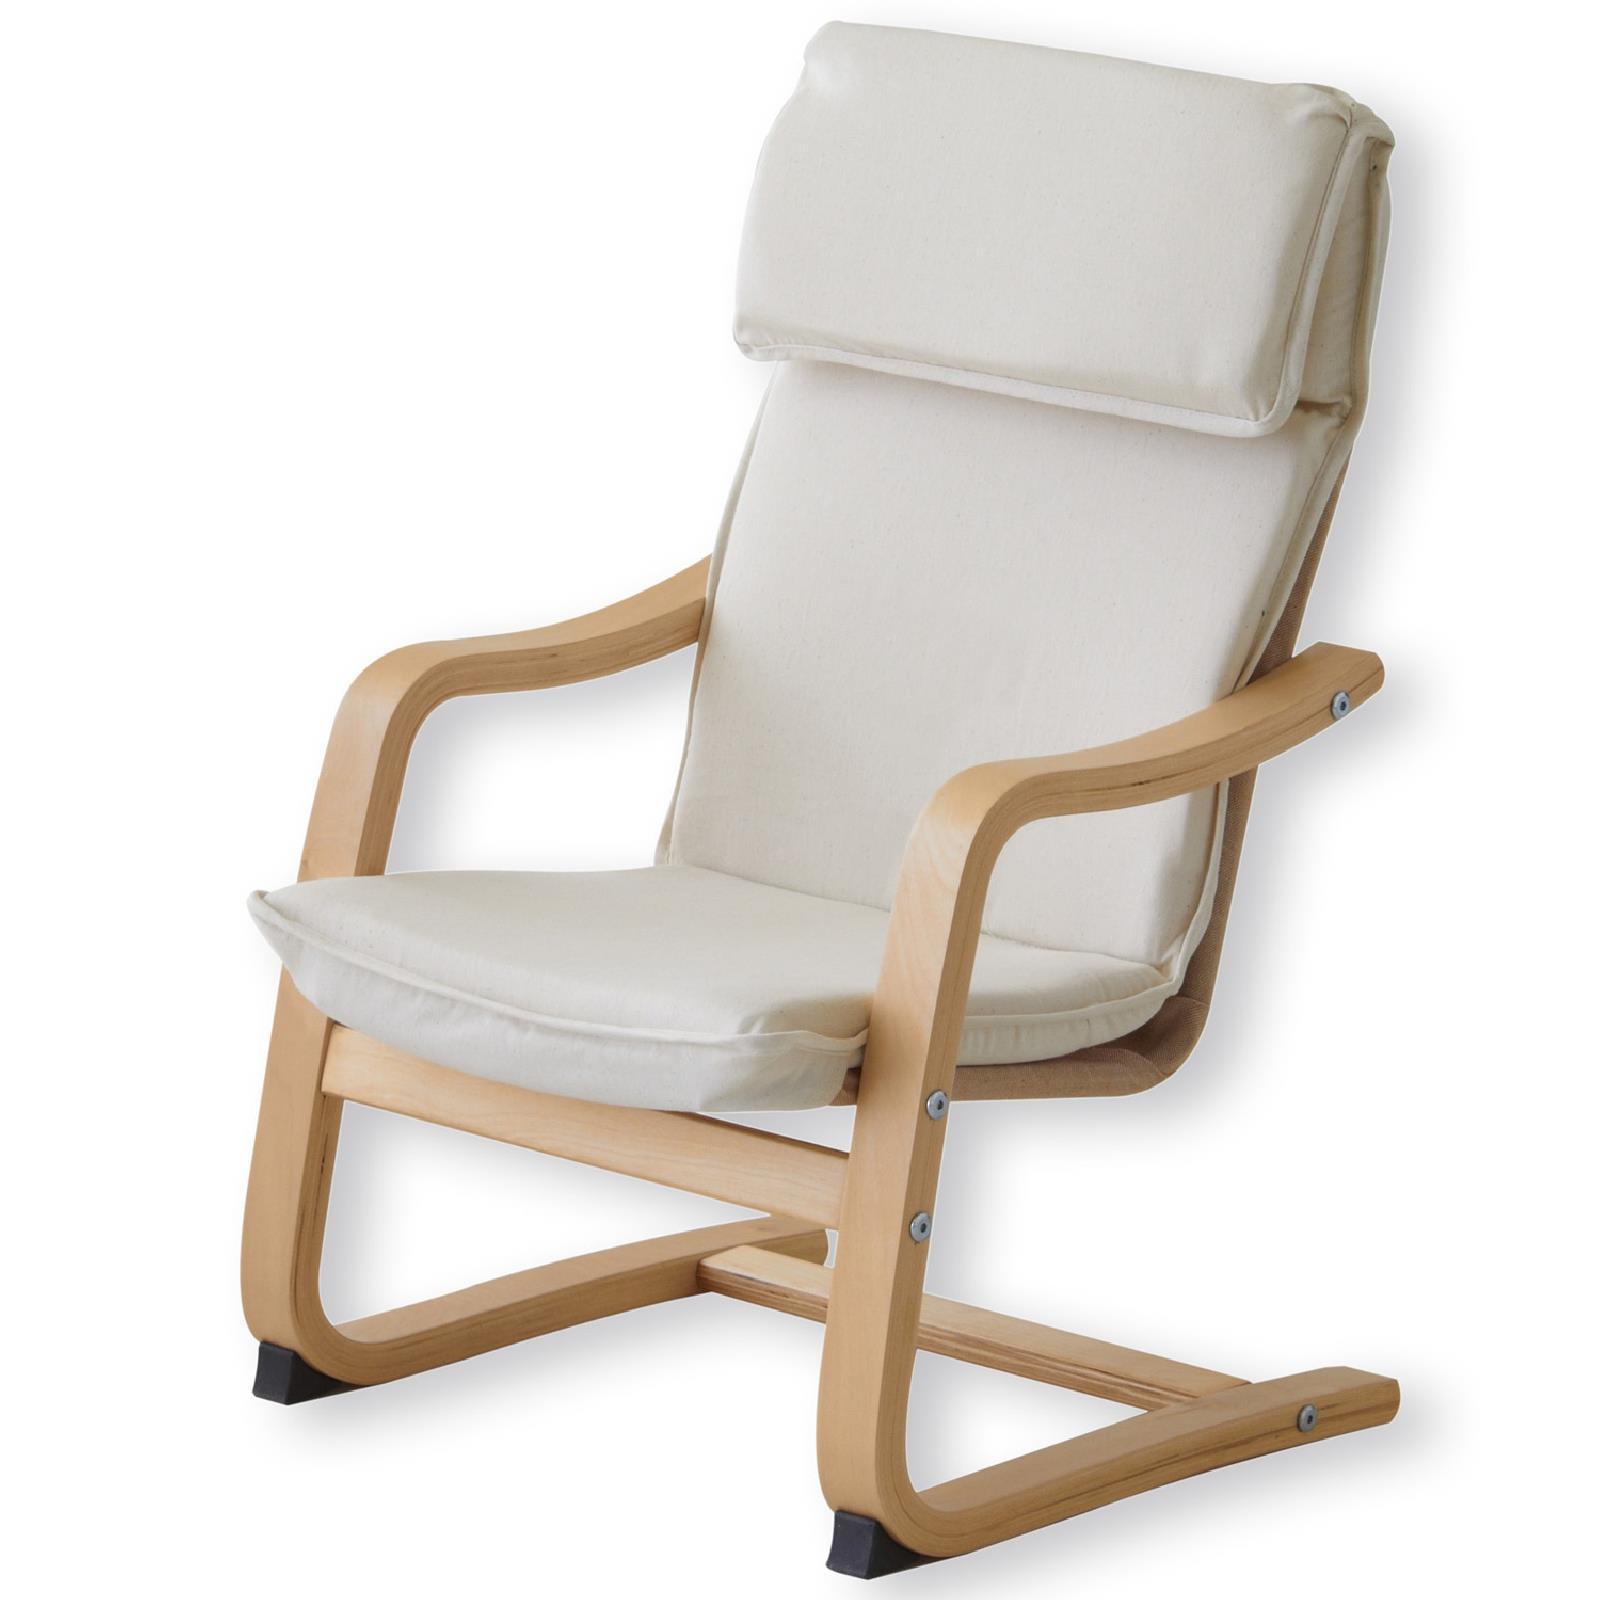 kinder relaxsessel in natur lackiert beige caro m bel. Black Bedroom Furniture Sets. Home Design Ideas